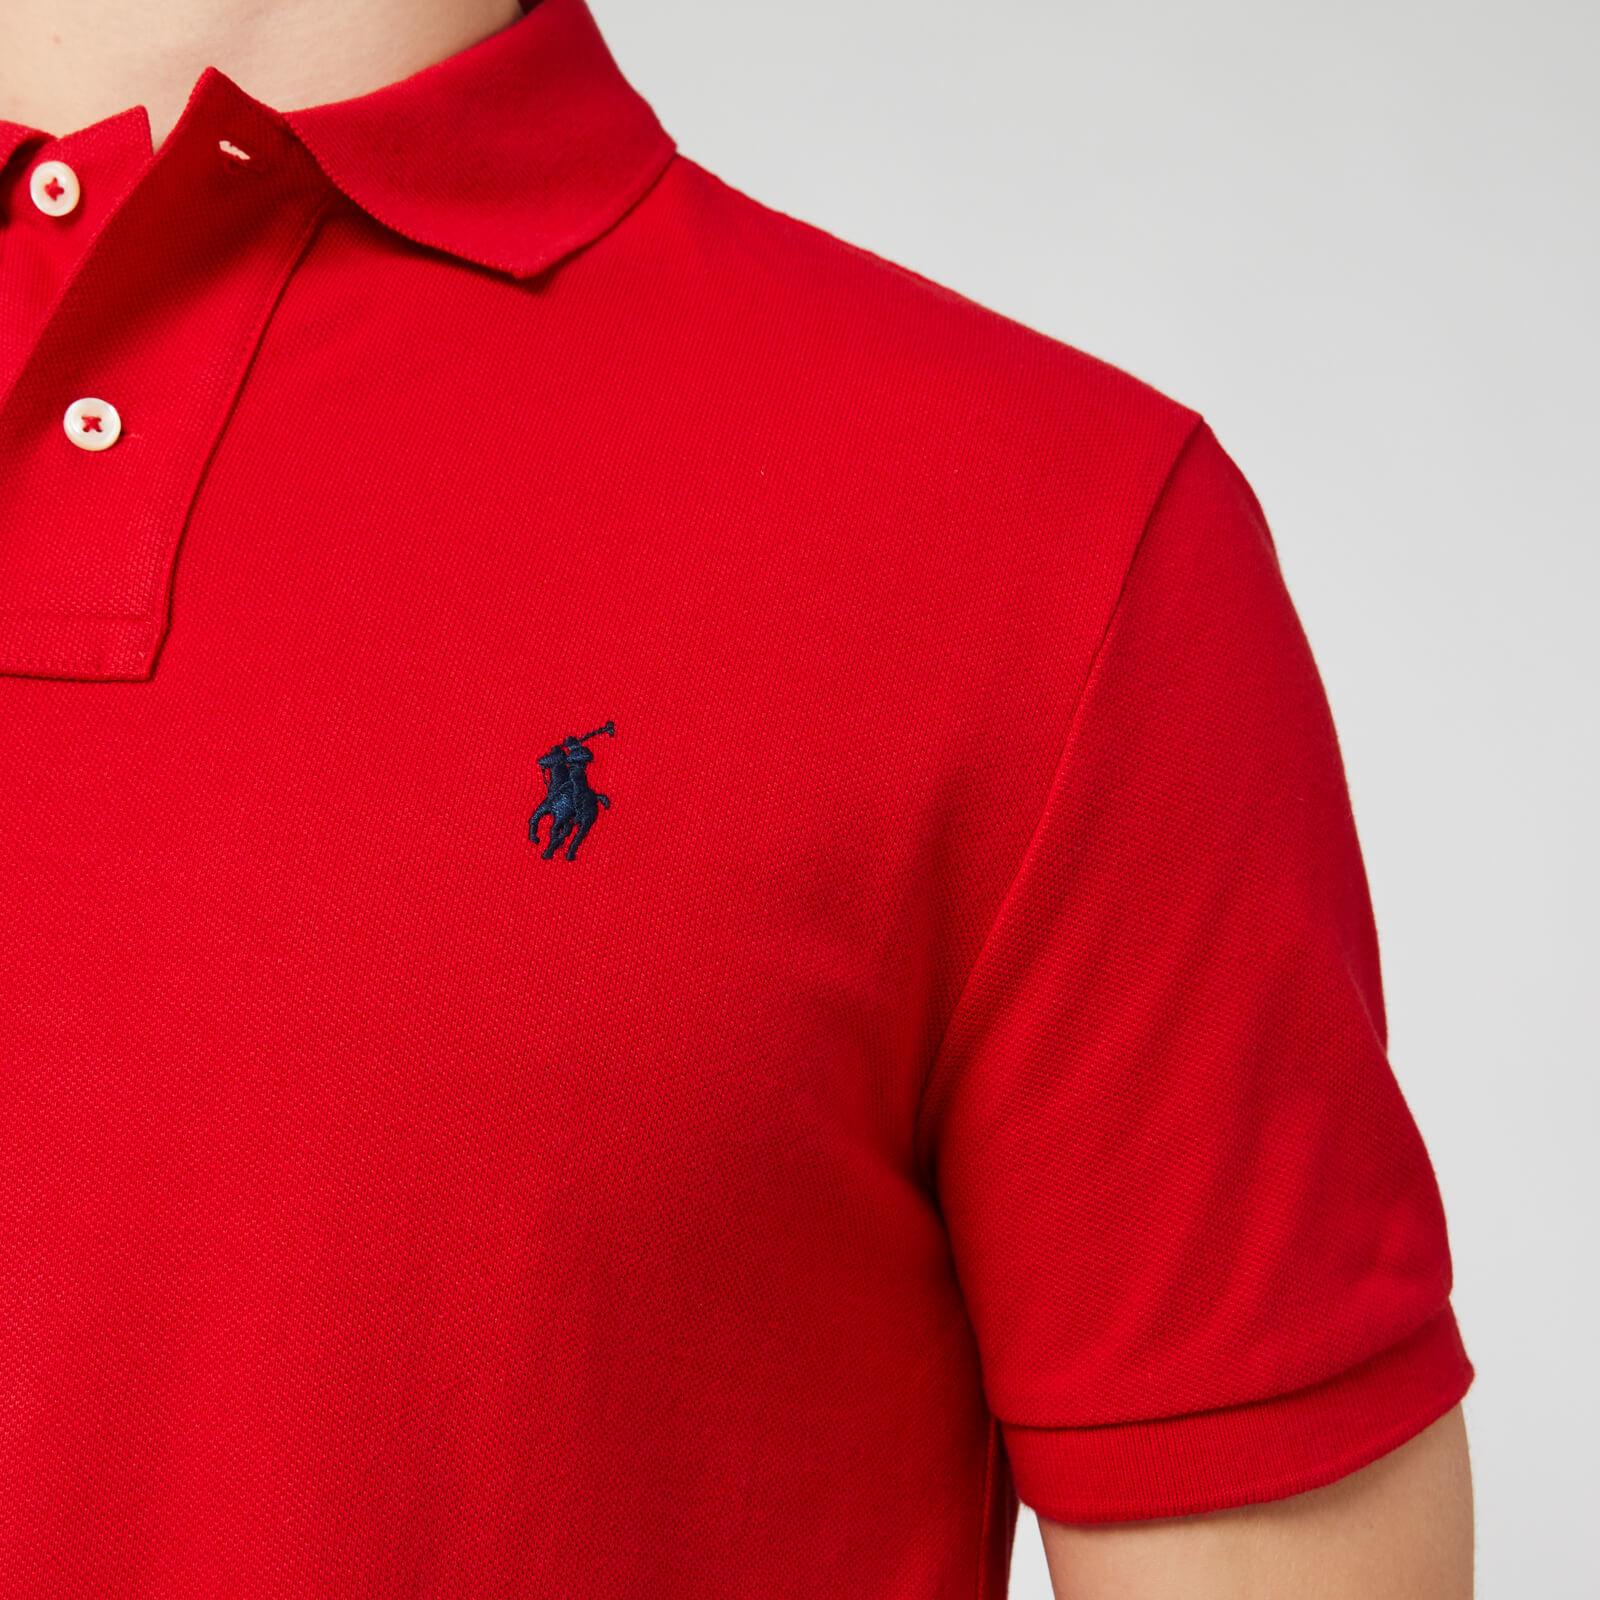 Polo Ralph Lauren Men's Custom Slim Fit Mesh Polo Shirt - Rl2000 Red - Xl 710666998003 Mens Tops, Red